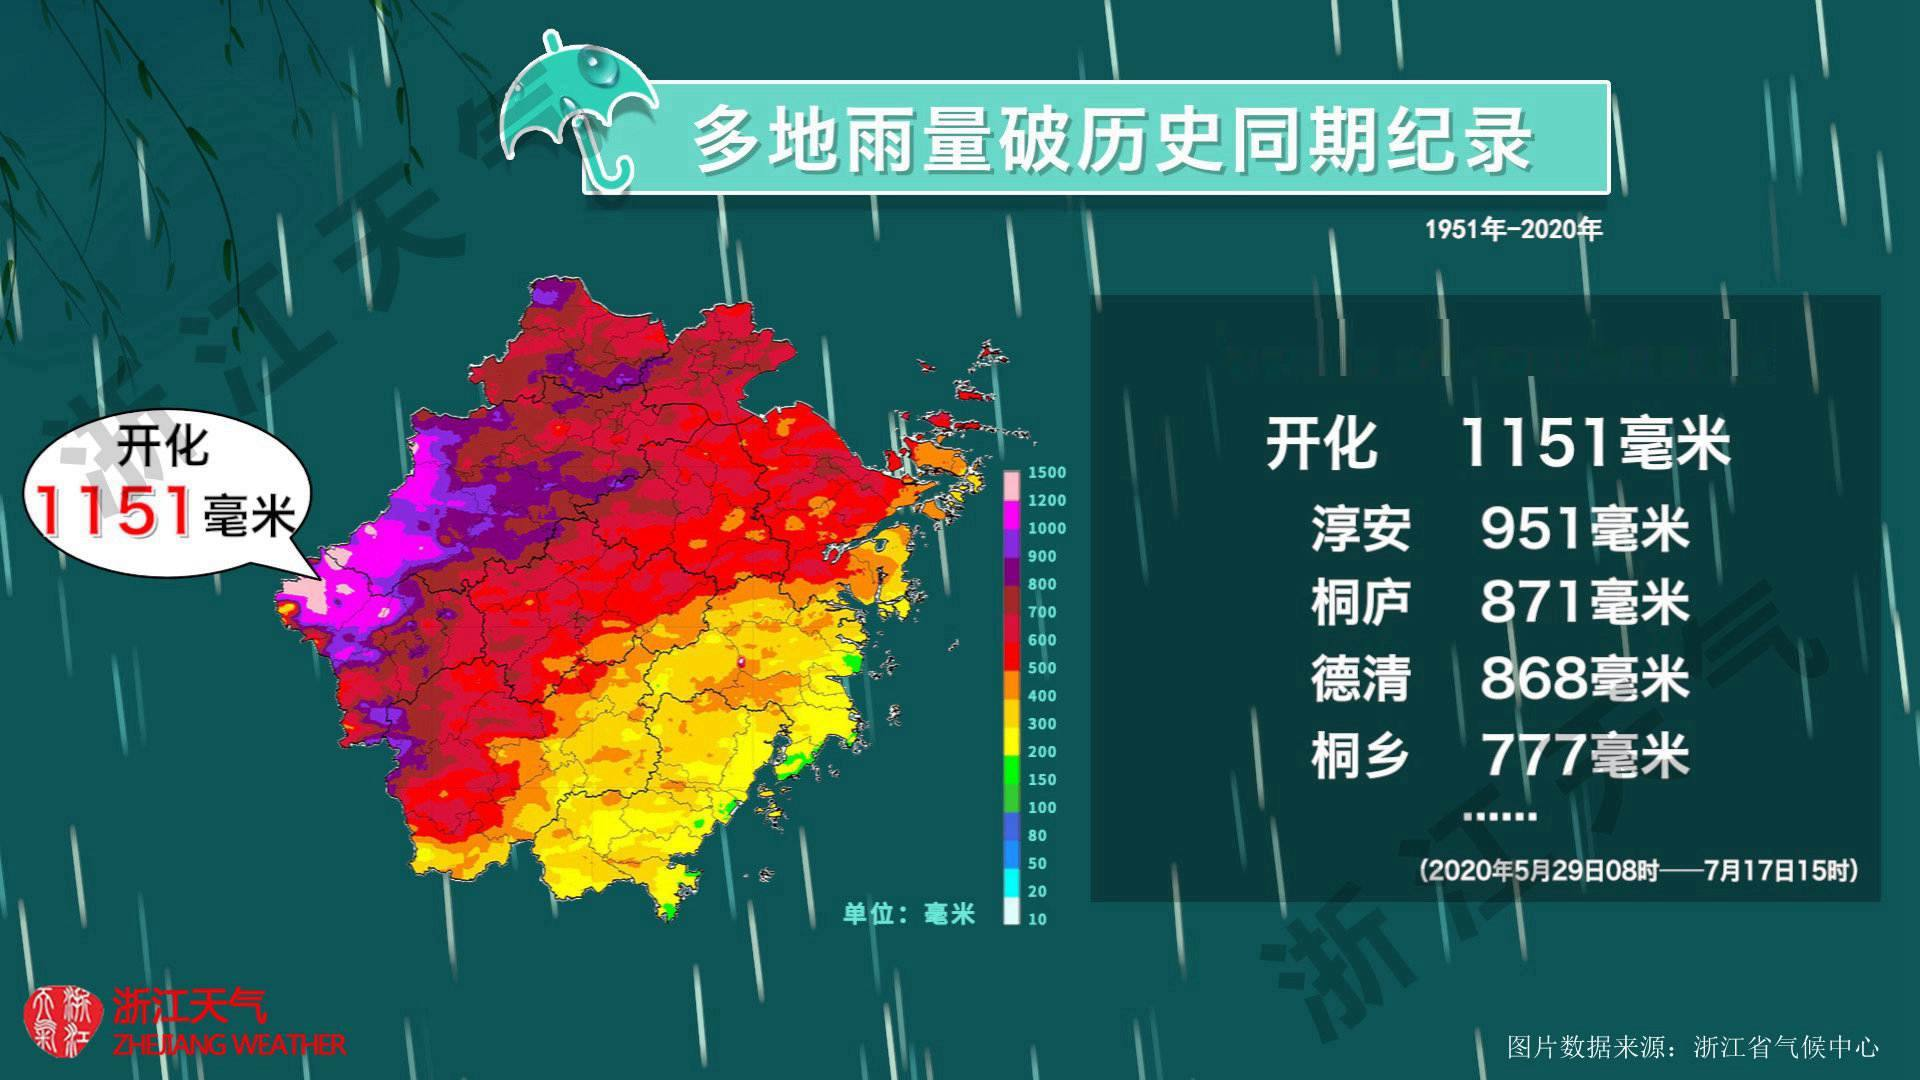 http://i.weather.com.cn/images/zhejiang1/rdzt/2020/07/19/1595150674483095352.jpg